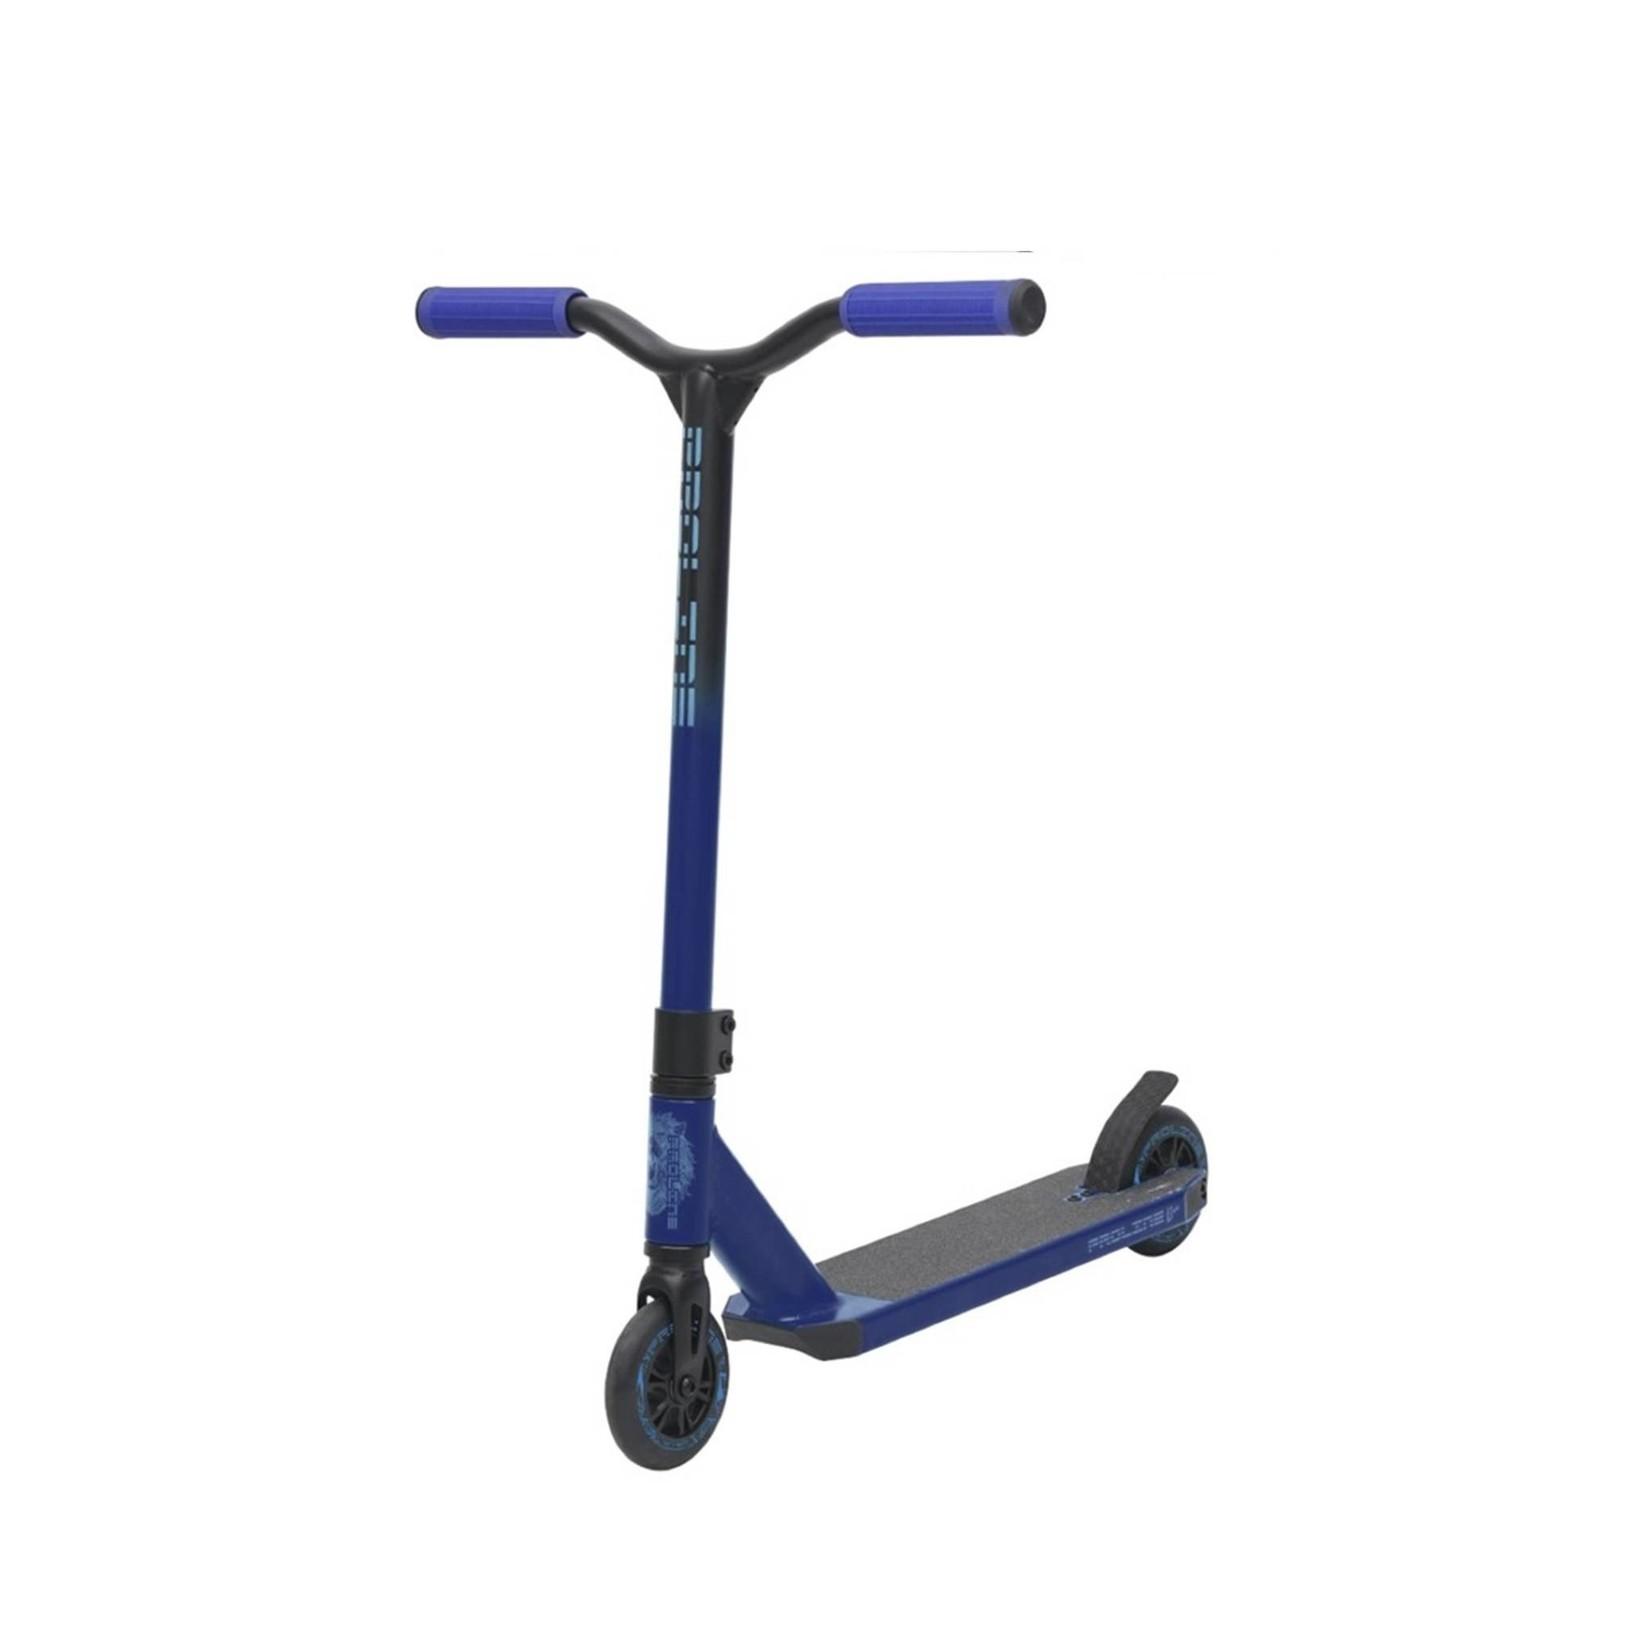 PROLINE Proline L1 Mini Scooter Blue